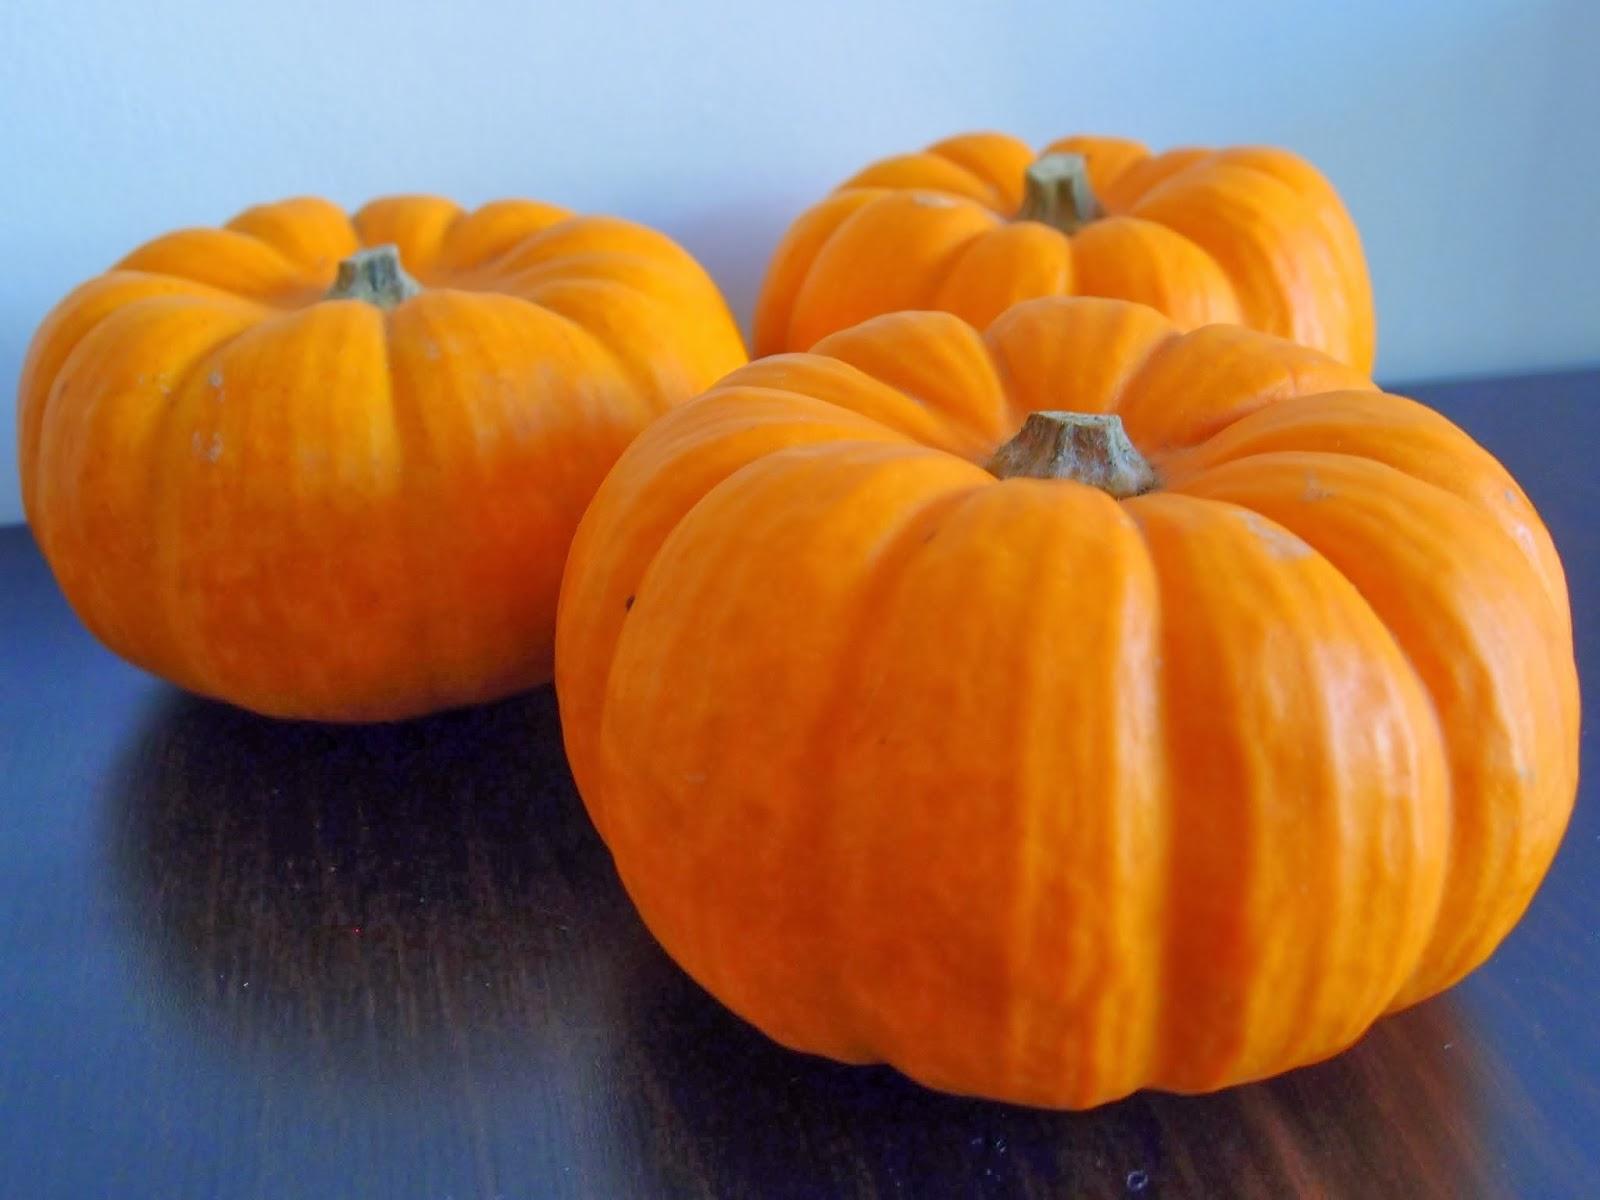 the veghog crusted munchkin pumpkin slices with potato